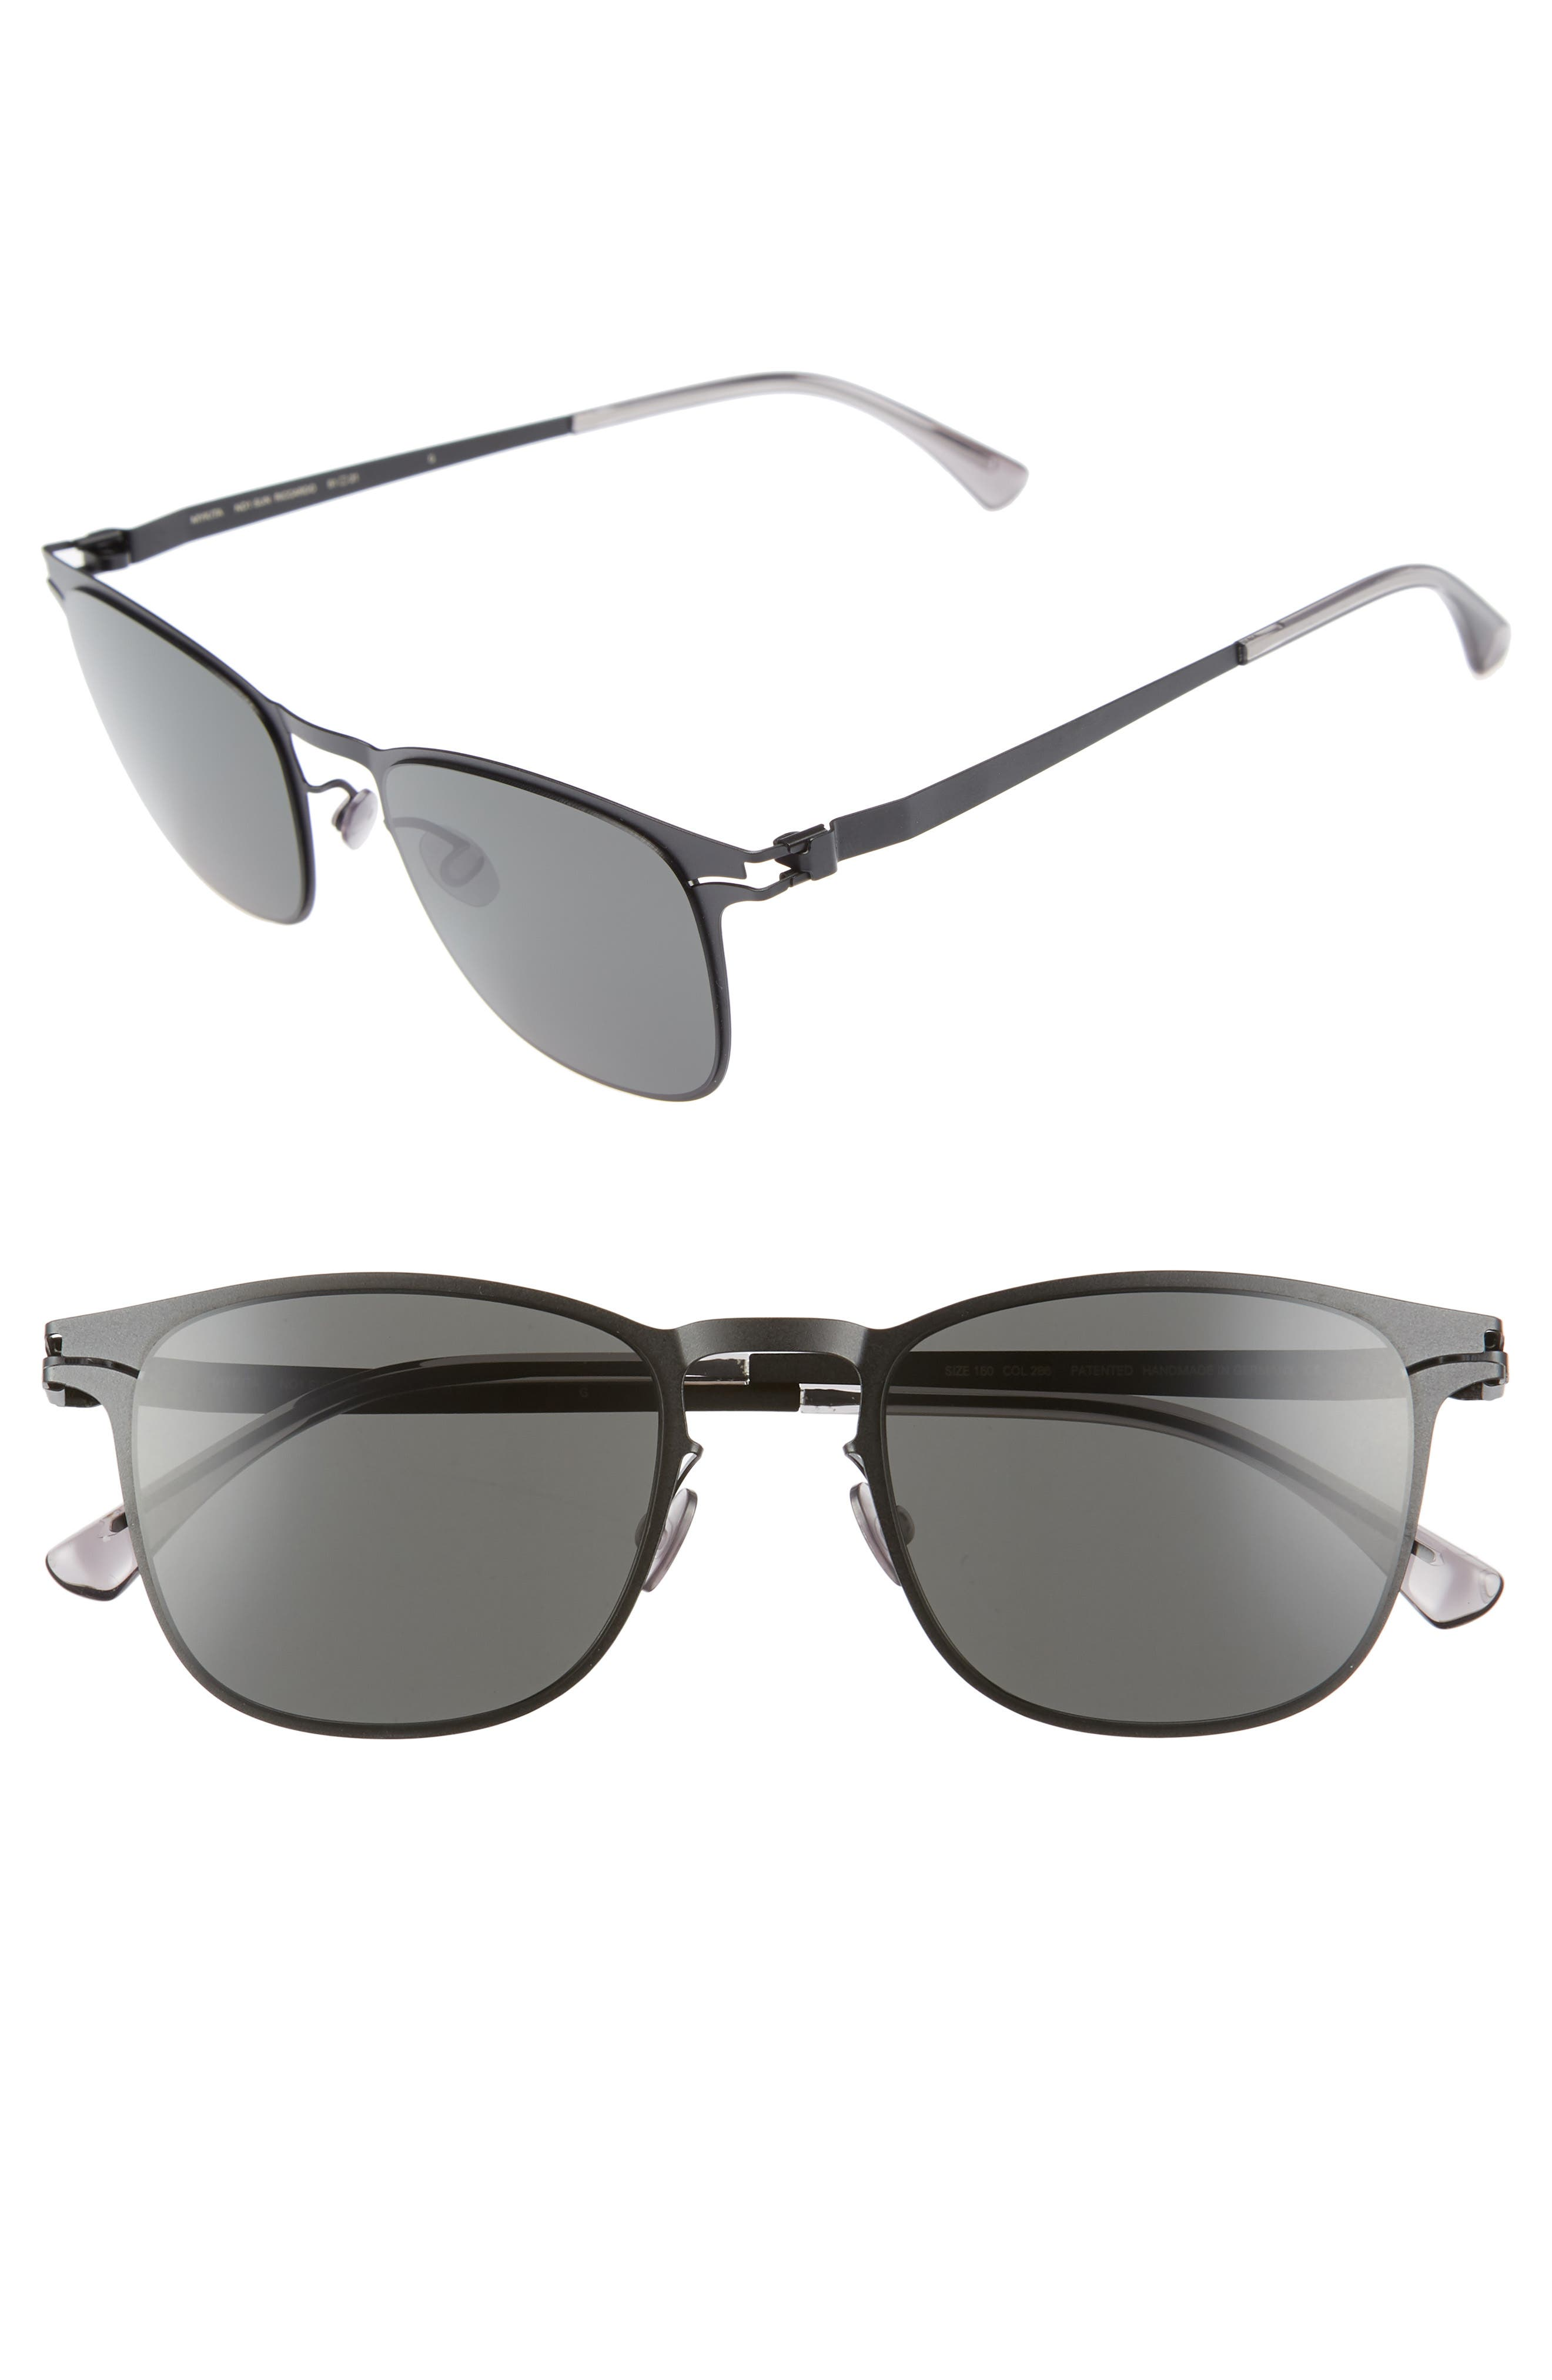 Riccardo 51mm Sunglasses,                             Main thumbnail 1, color,                             Matte Black